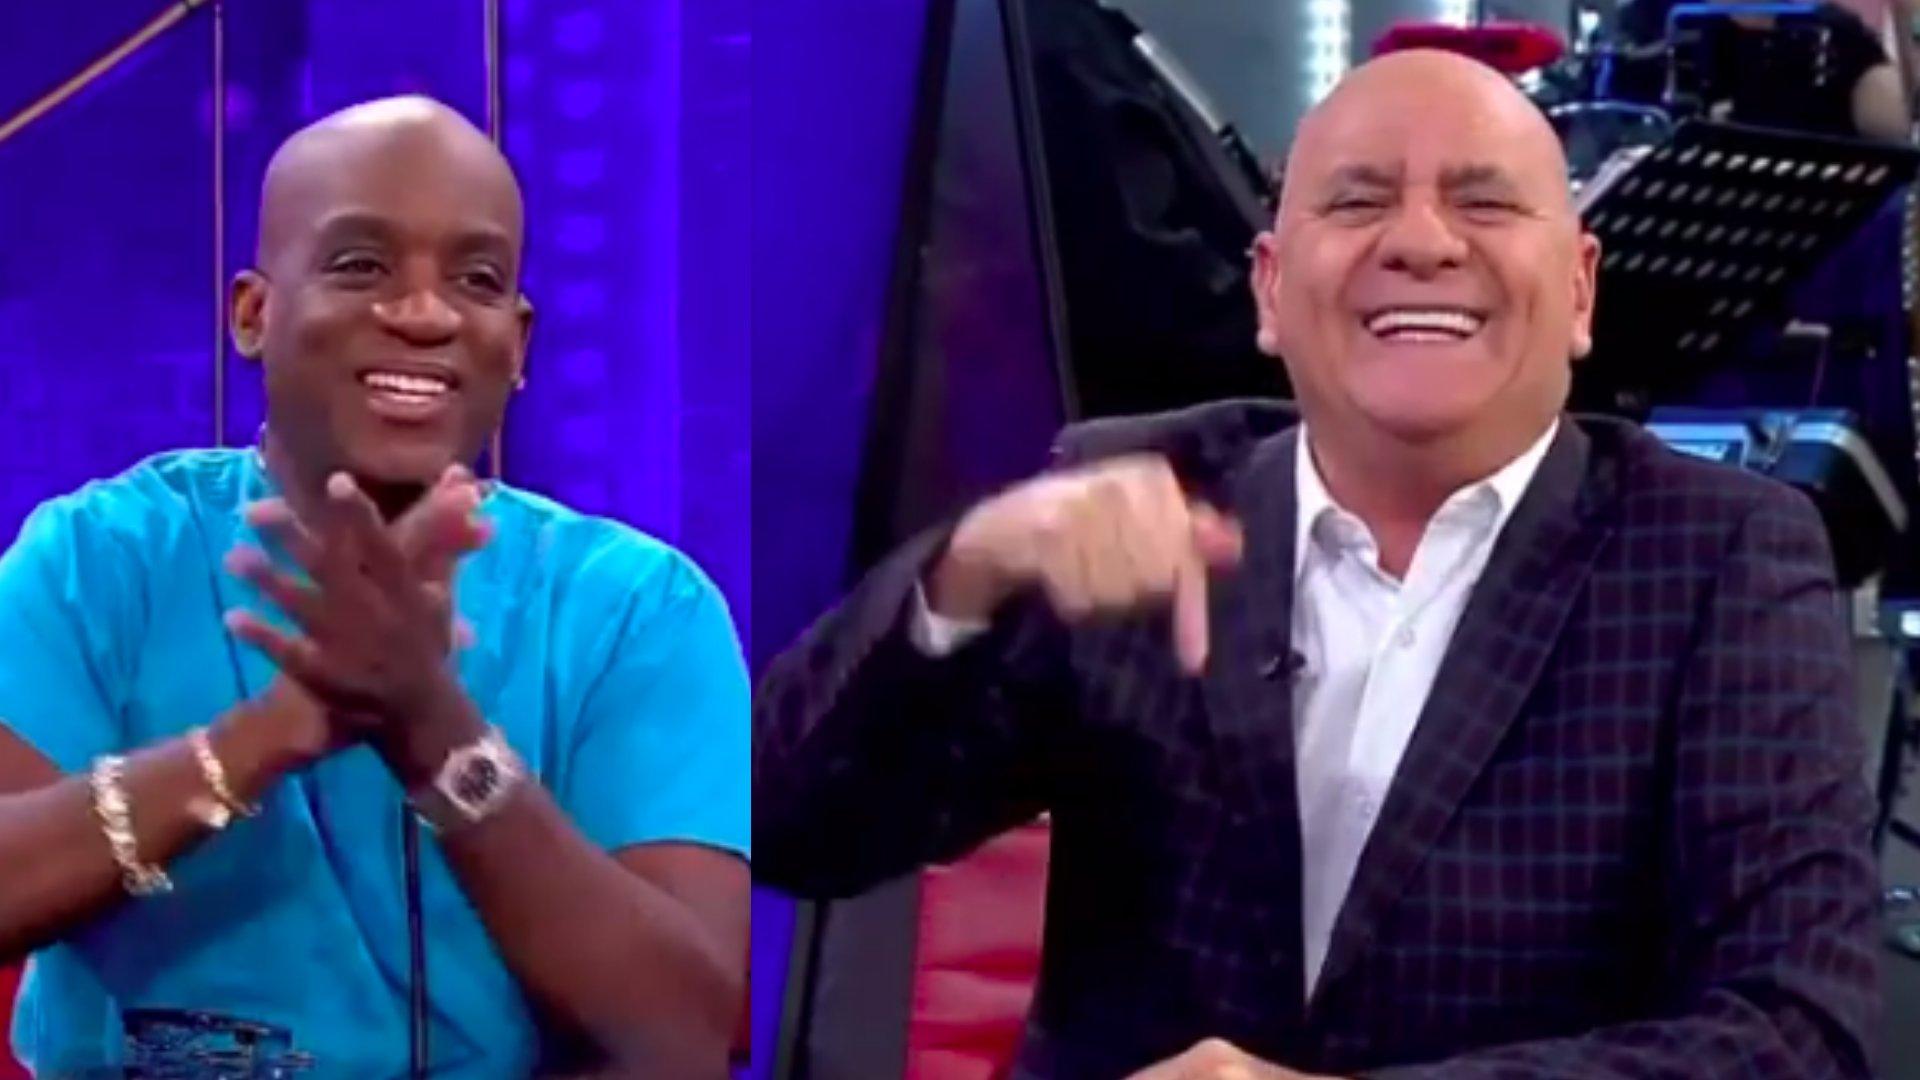 Regresa Boncó Quiñongo junto a Carlos Otero al show televisivo TN3